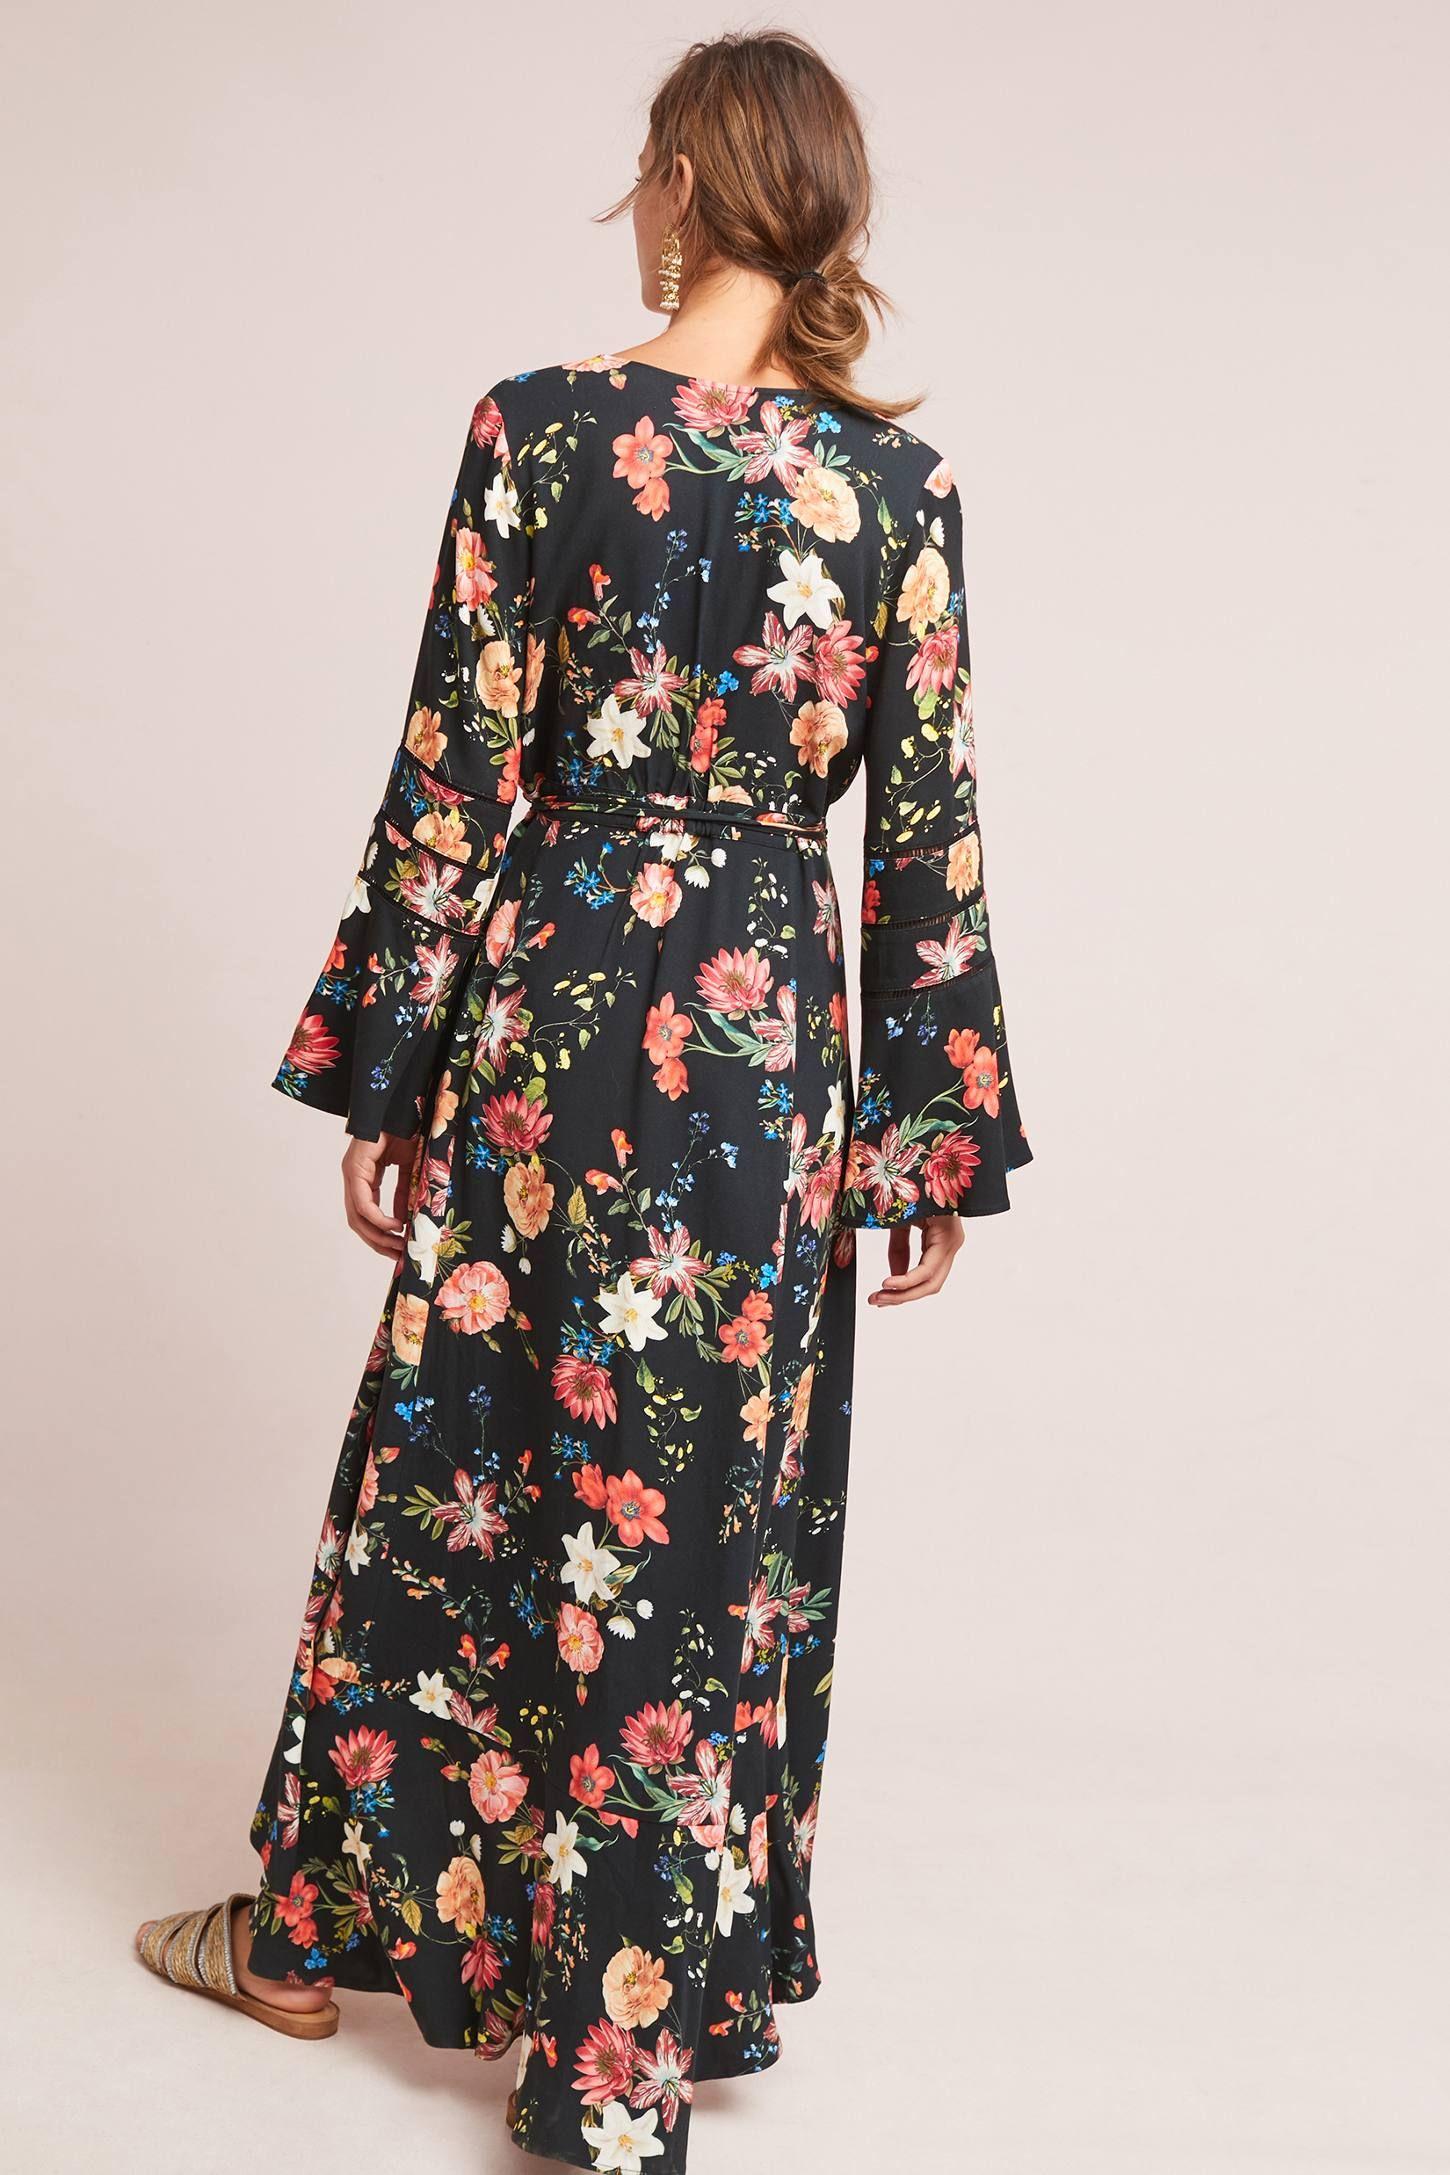 ac849eebac151 Farm Rio Summer Flower Wrap Dress | Dress Ideas | How to wrap ...